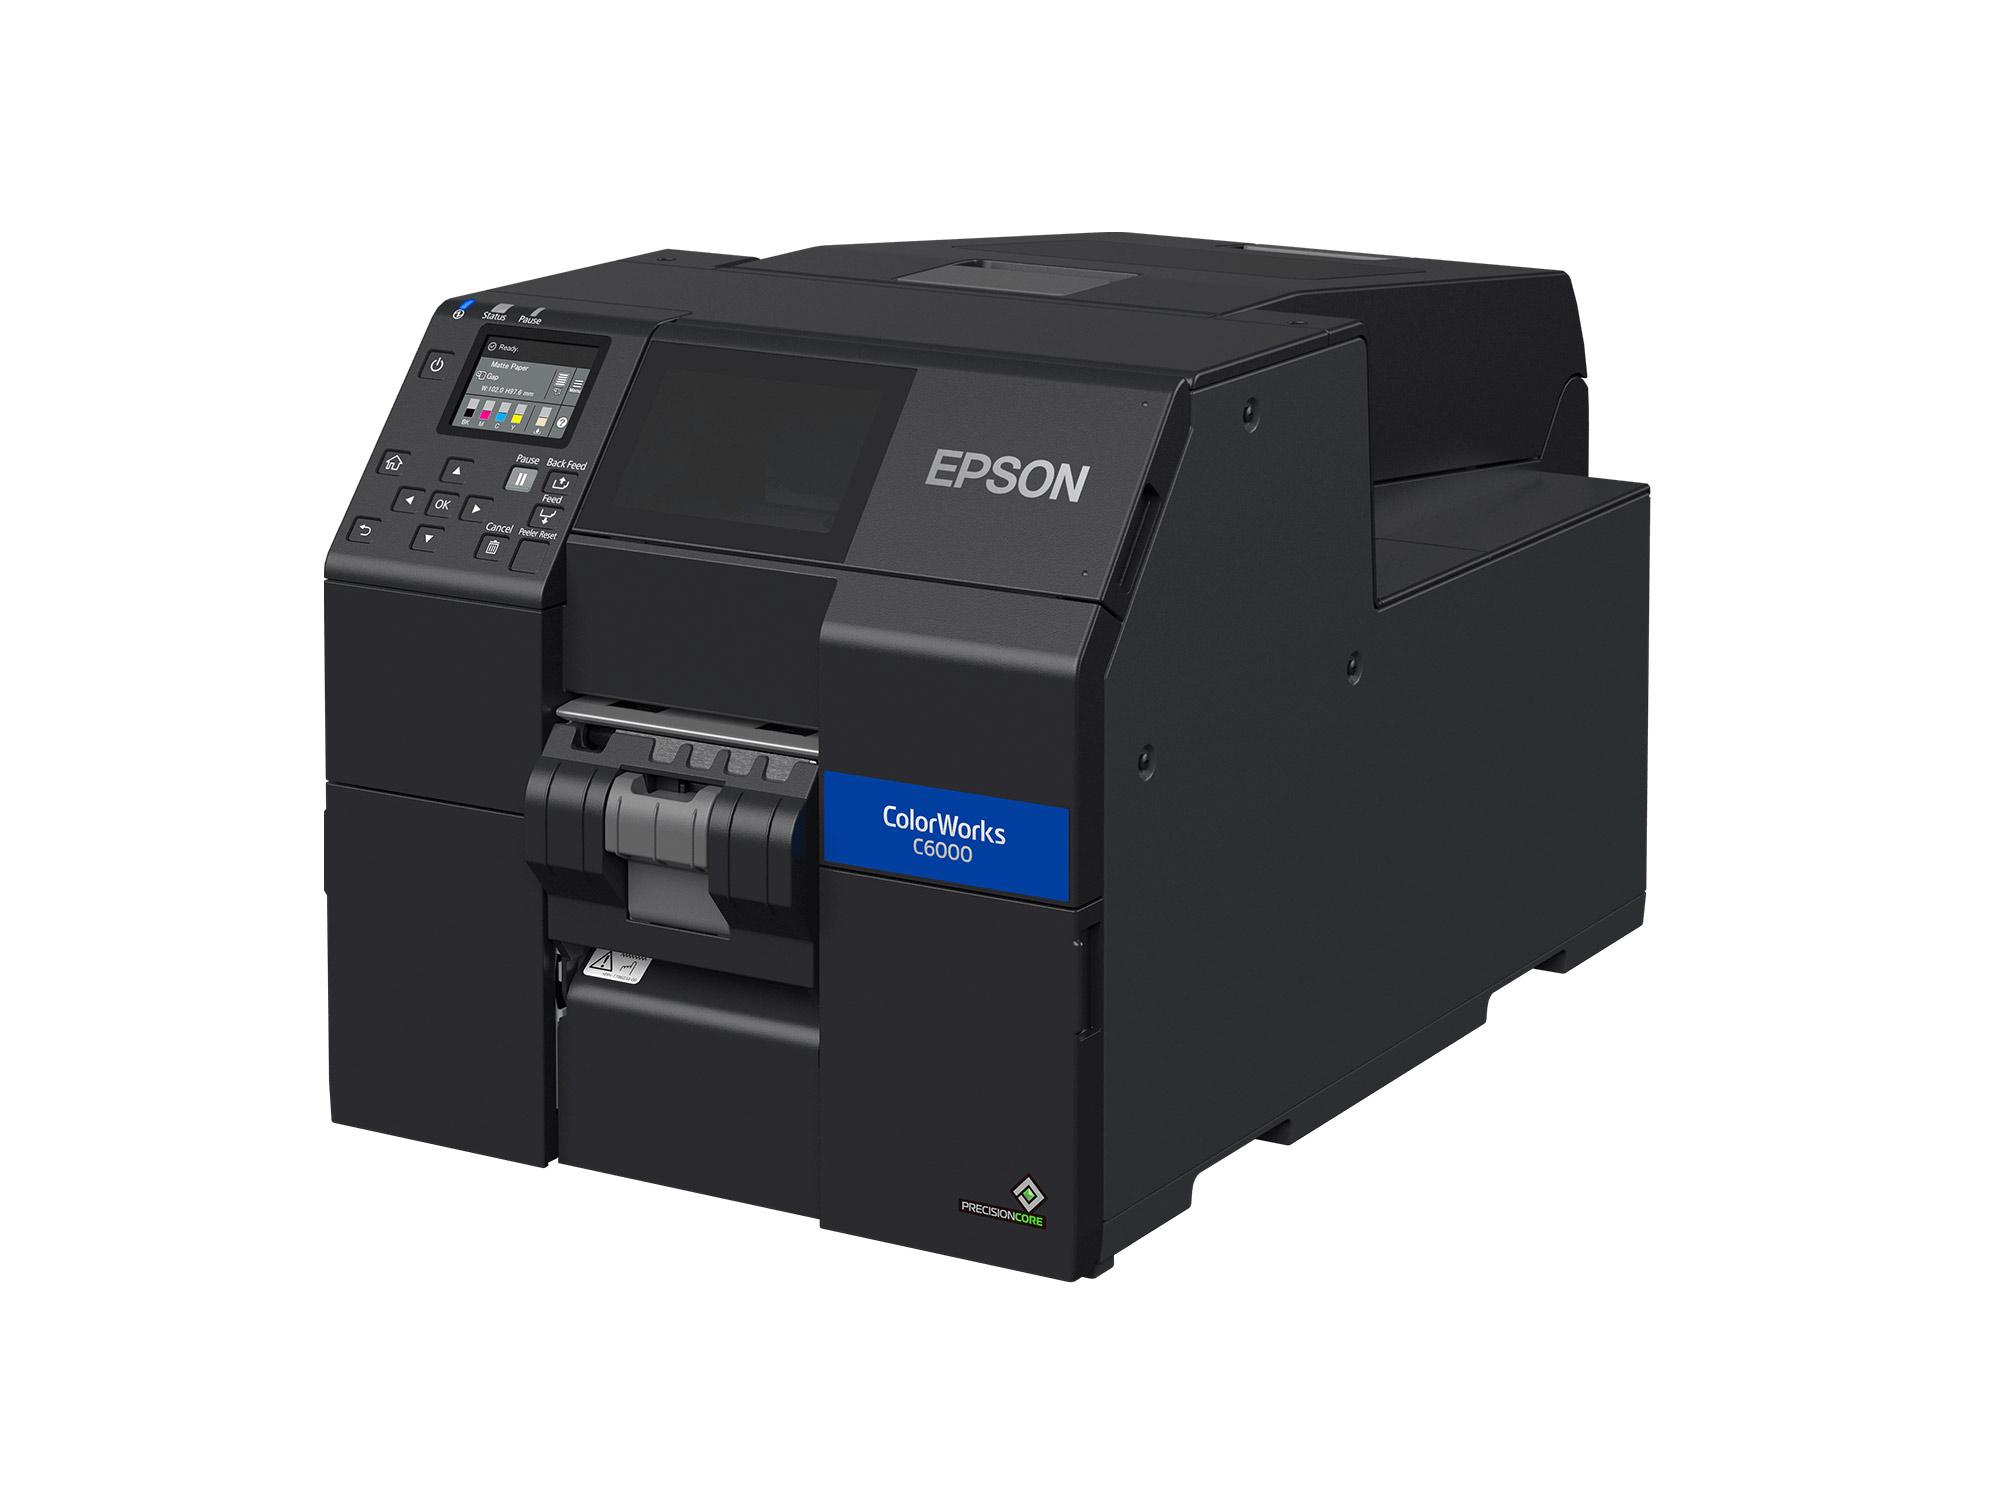 Epson ColorWorks C6000Pe Farbetikettendrucker